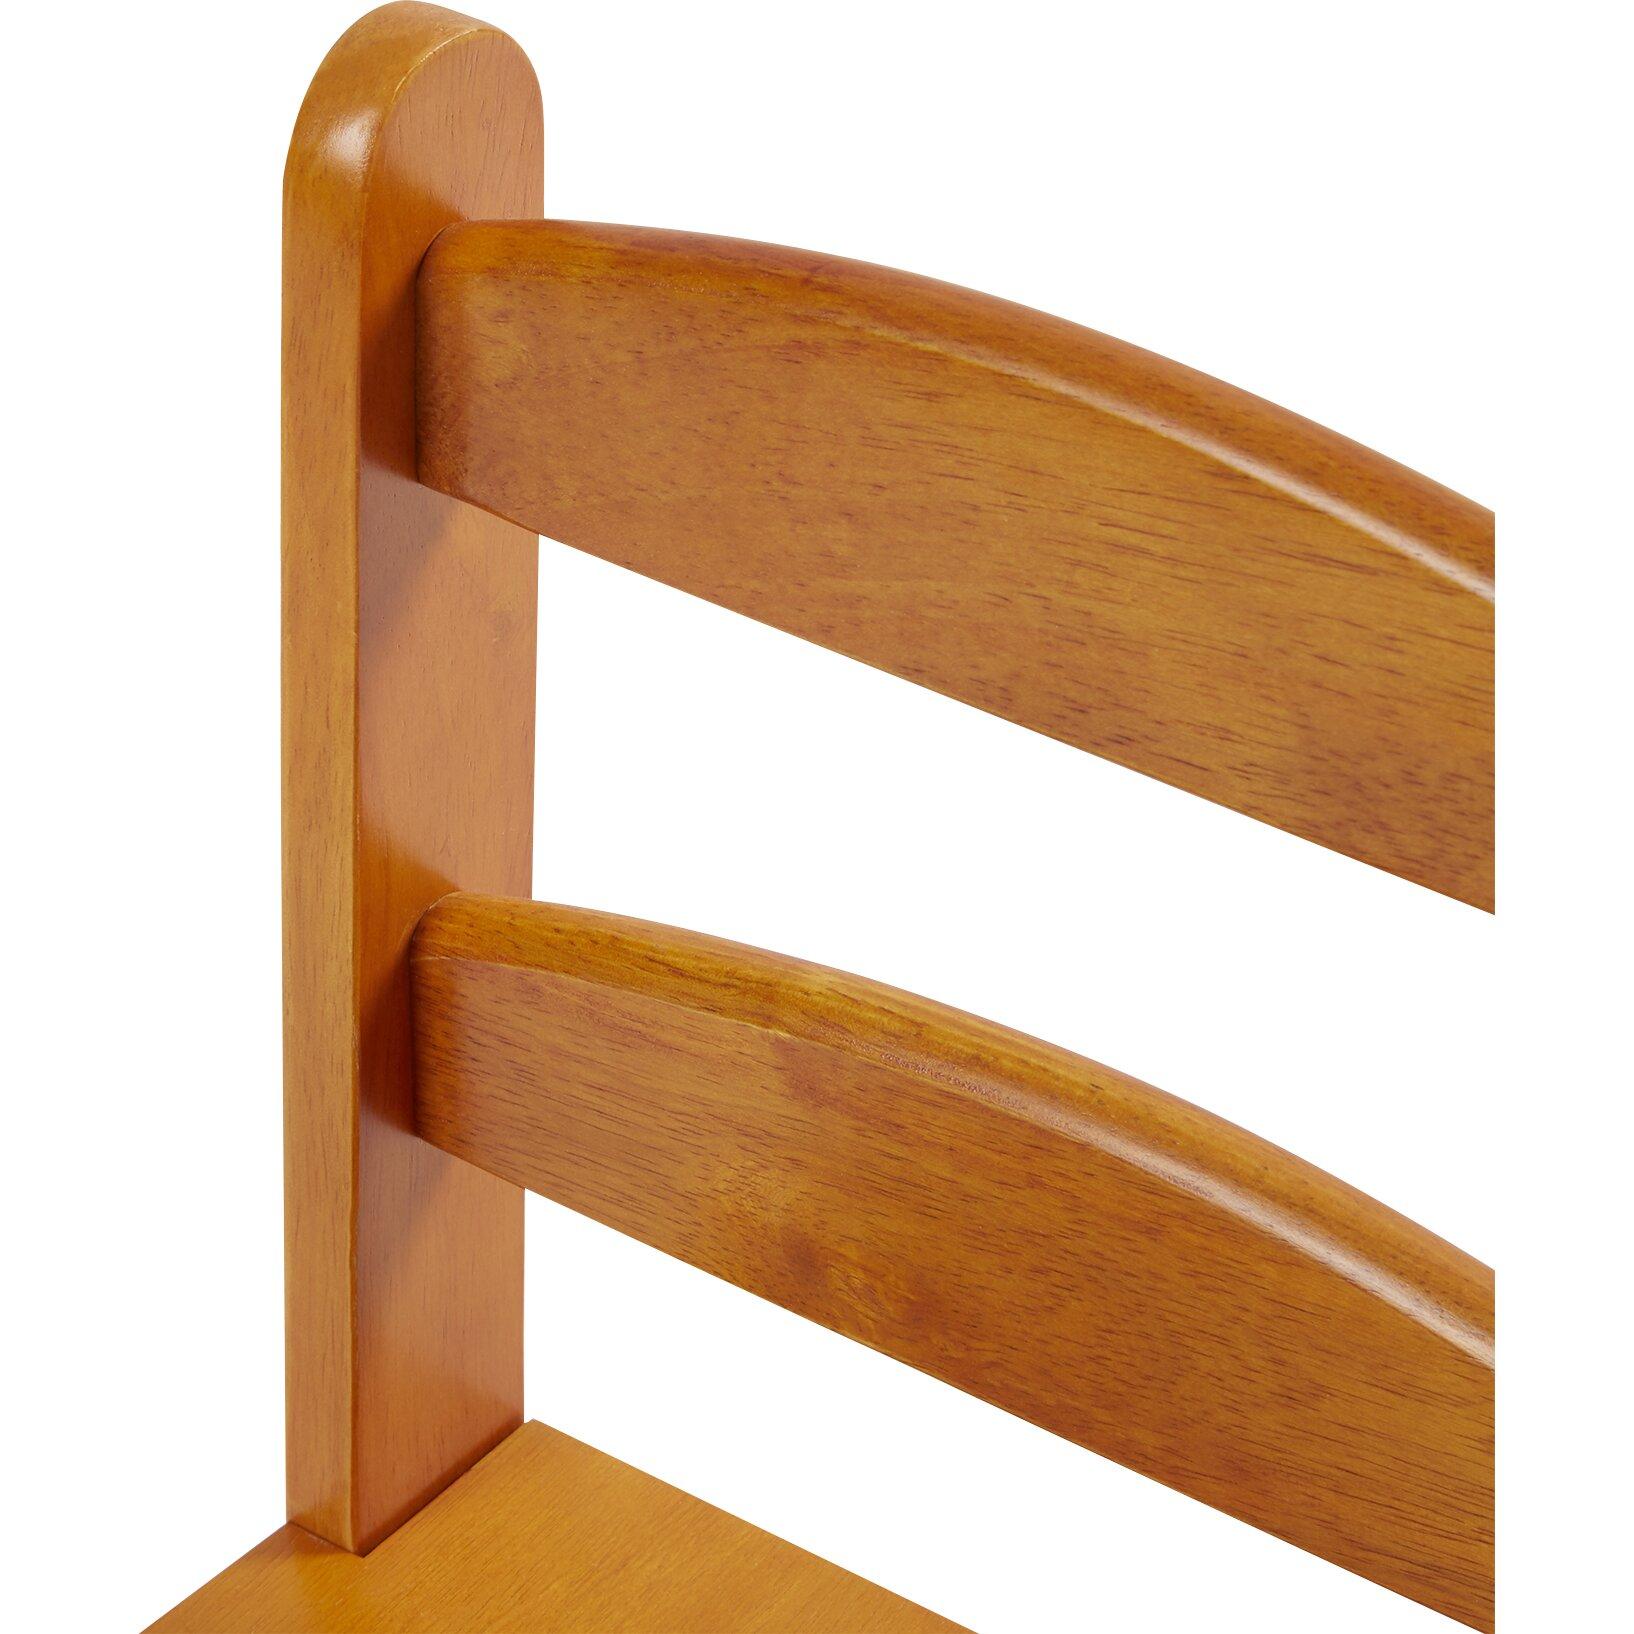 Wayfair Furniture Kitchen Benches Free Home Design Ideas